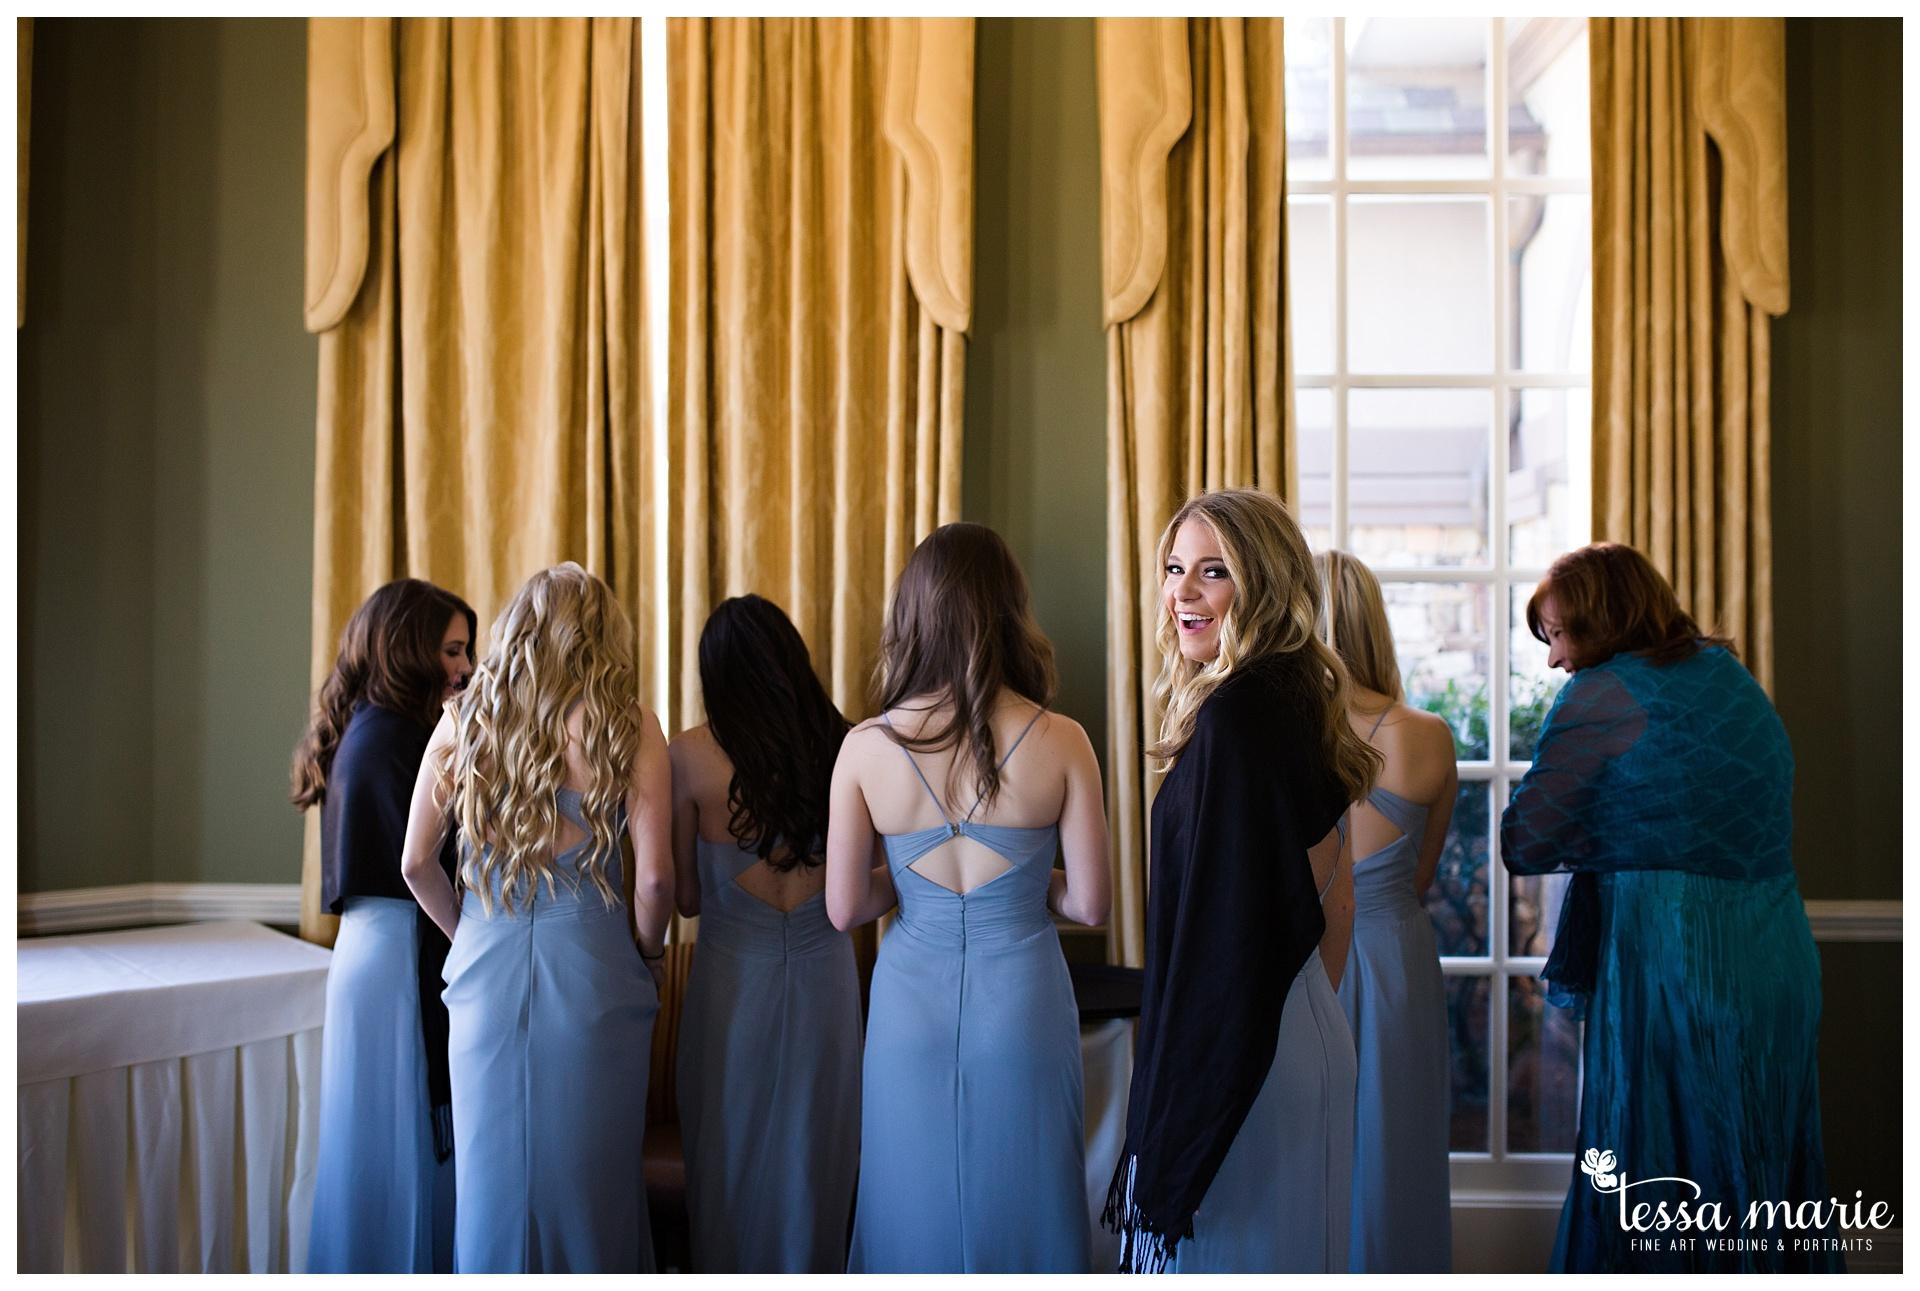 tessa_marie_weddings_legacy_story_focused_wedding_pictures_atlanta_wedding_photographer_0067